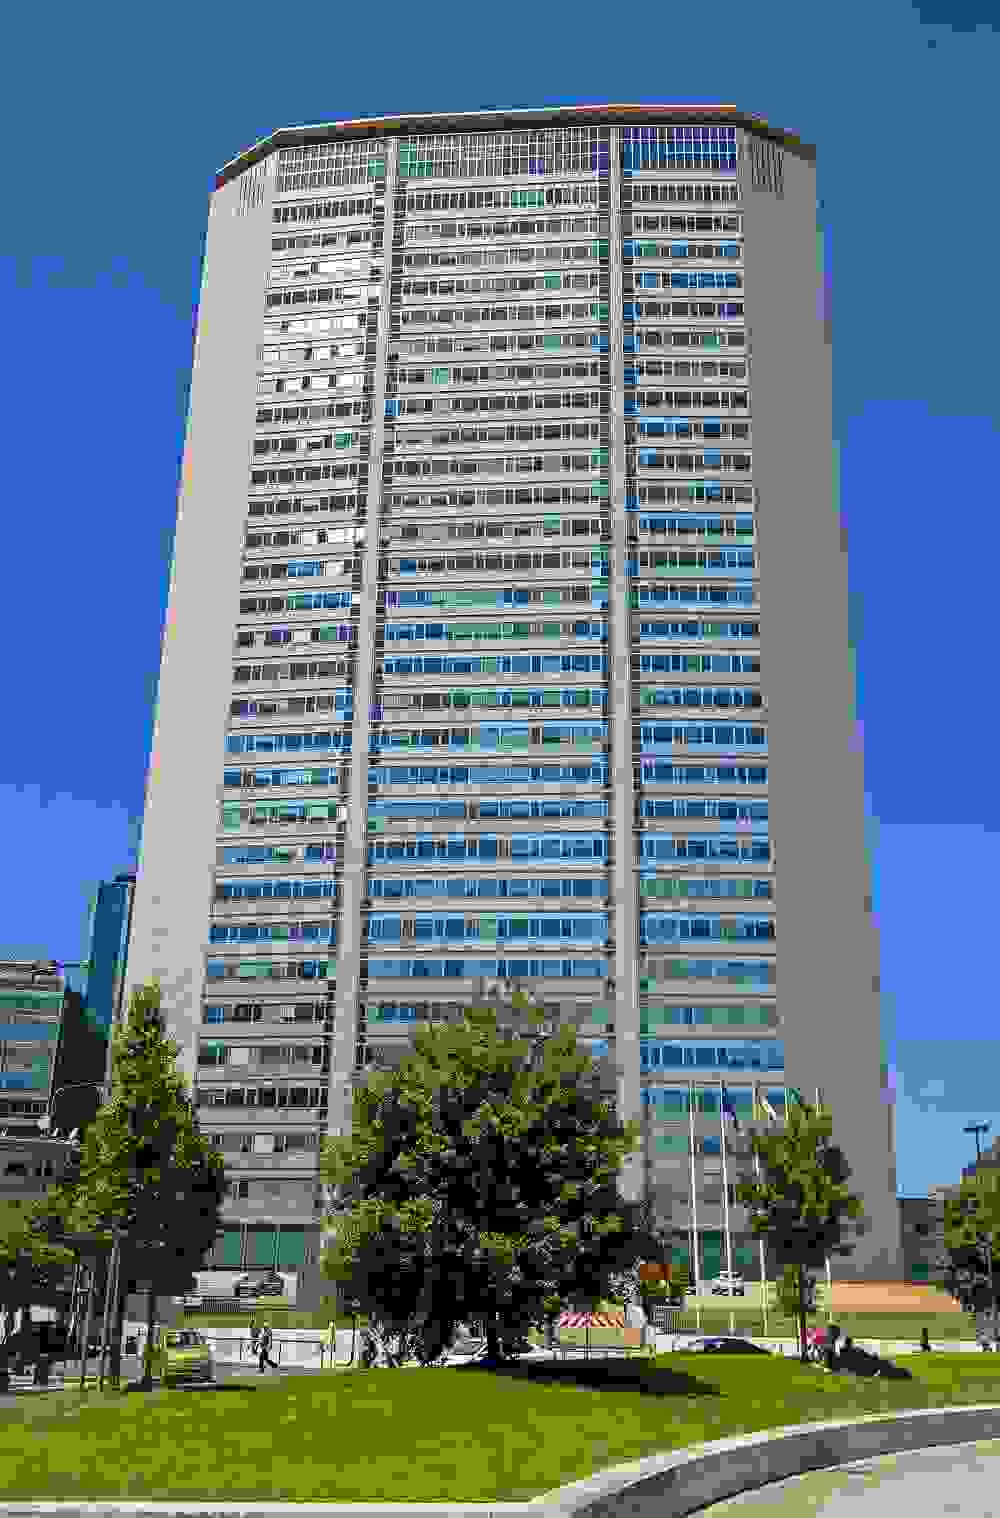 Pirelli Tower (1958-60) by Gio Ponti and Pier Luigi Nervi   Source: wikipedia.org